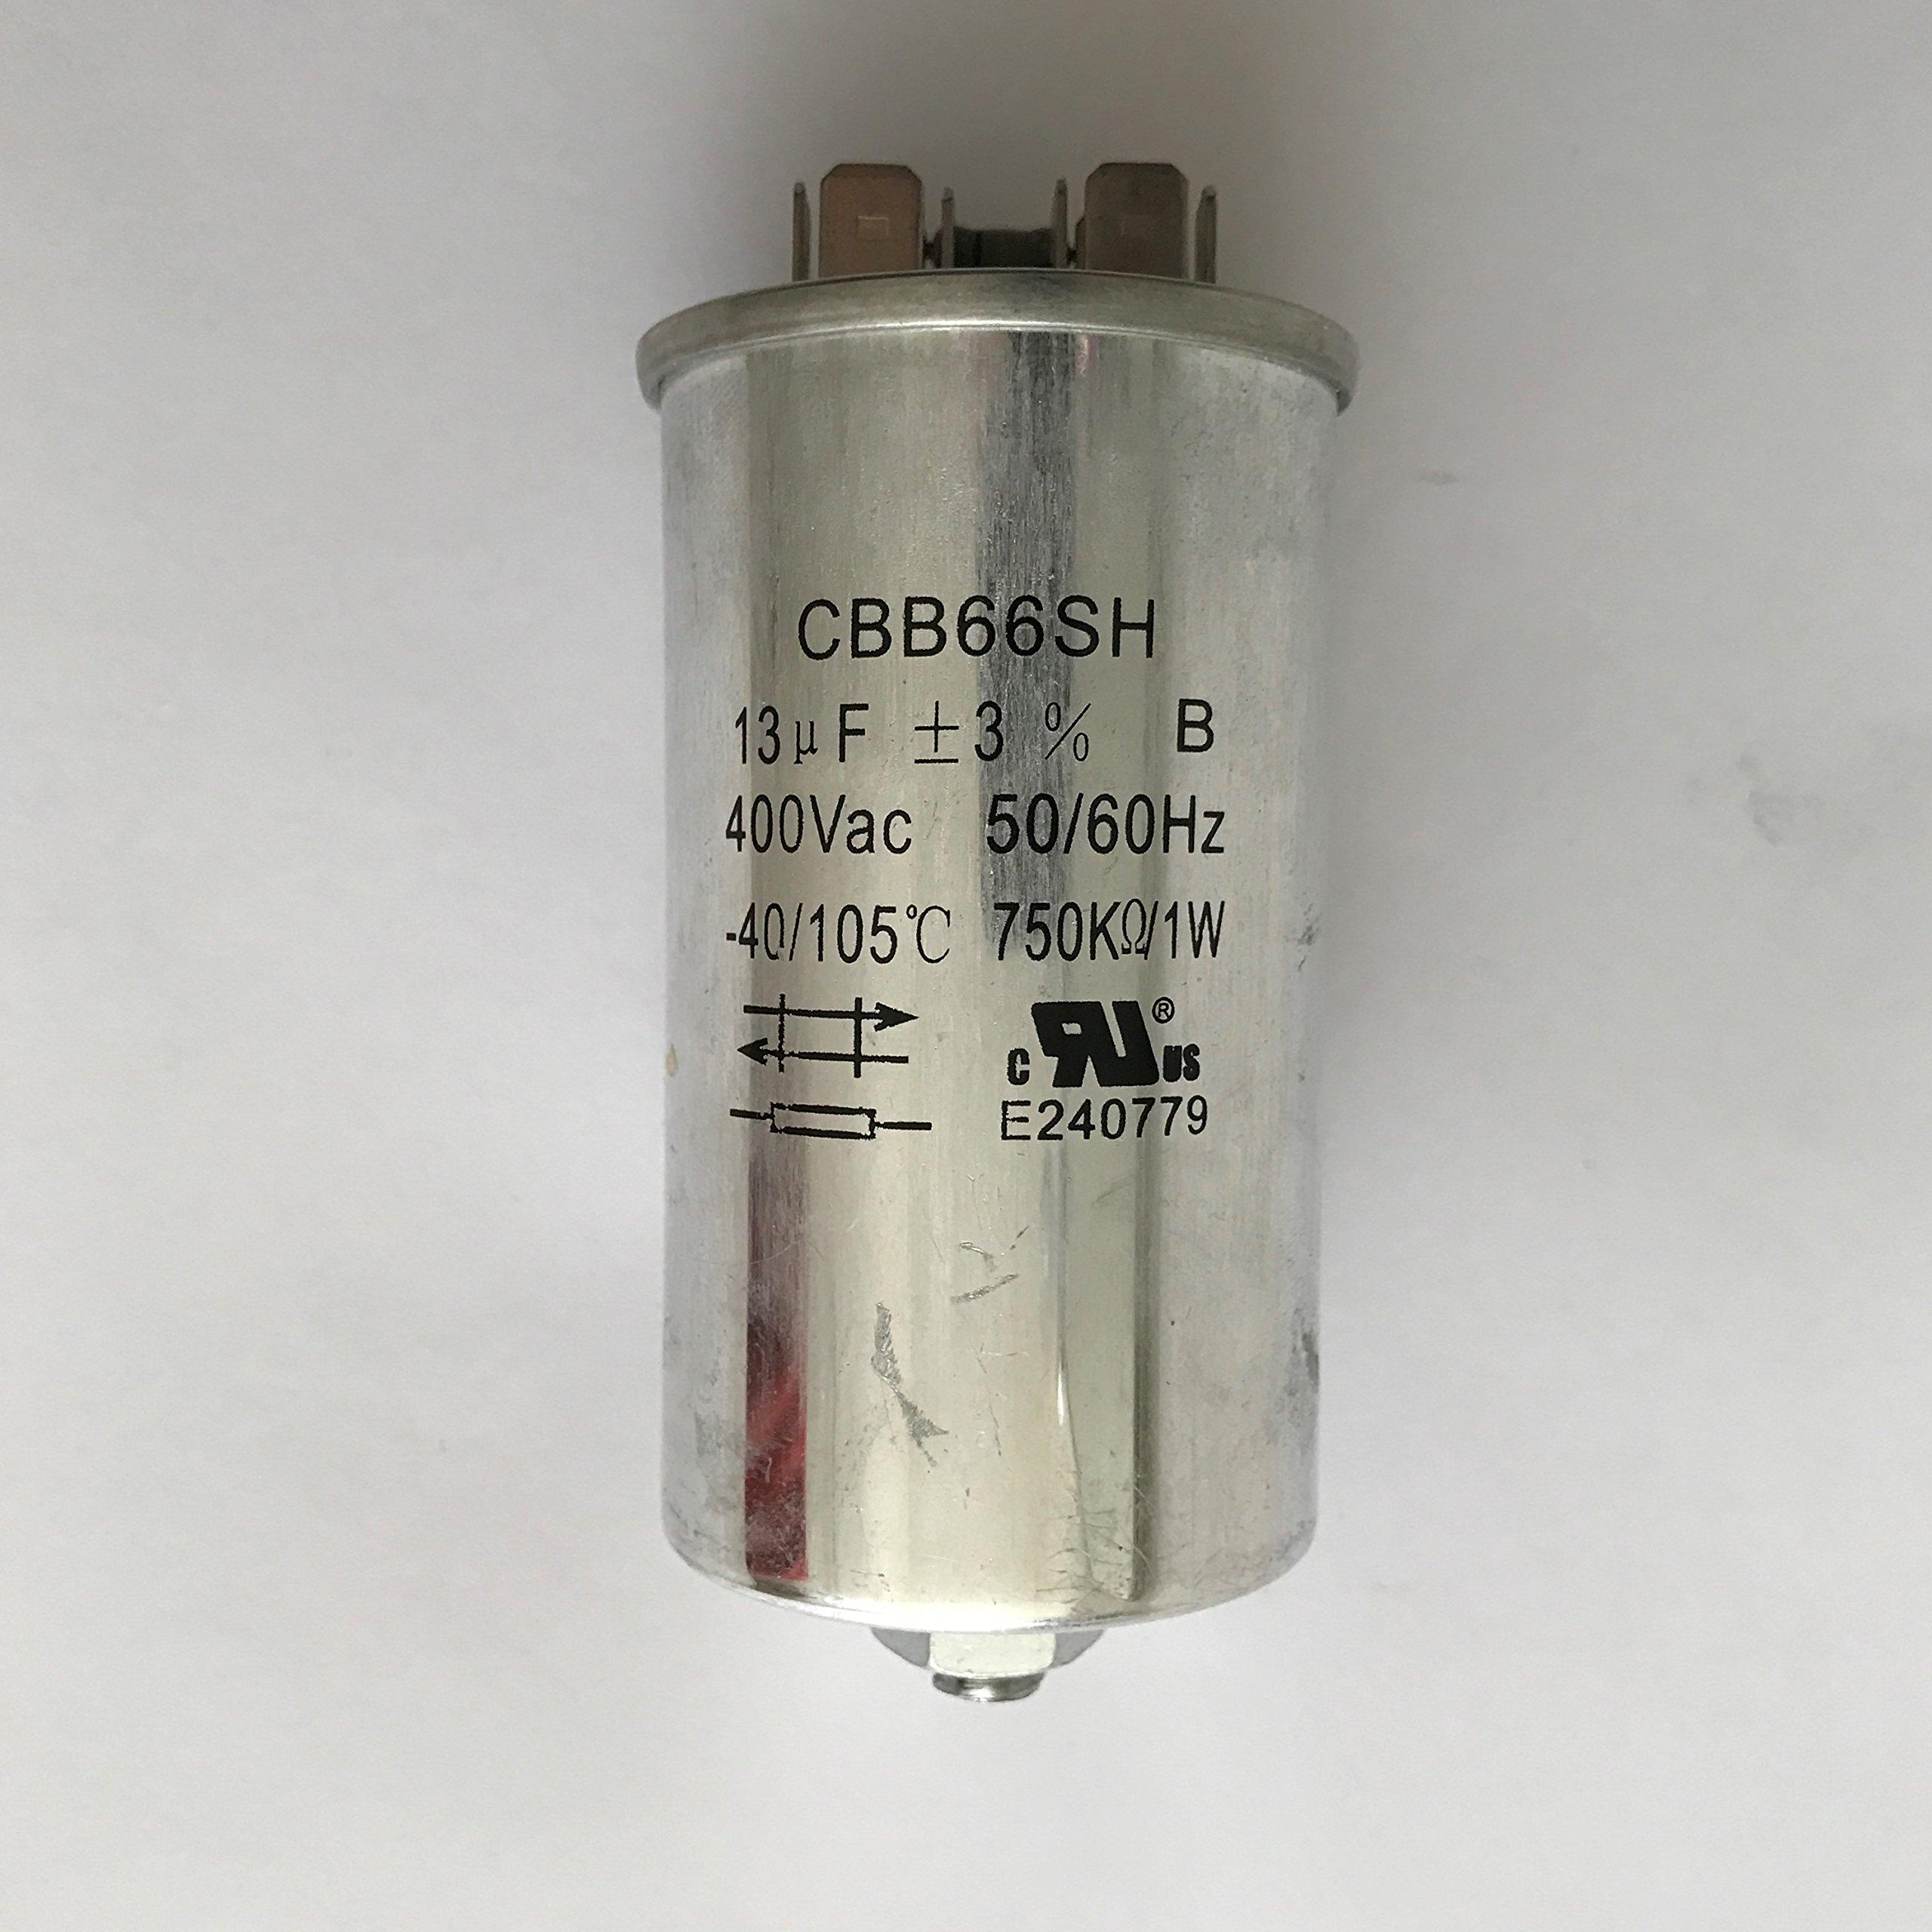 Capacitor 13uF/400VAC 120-480 Volt for Metal Halide 200 Watt-PS (1 Piece)